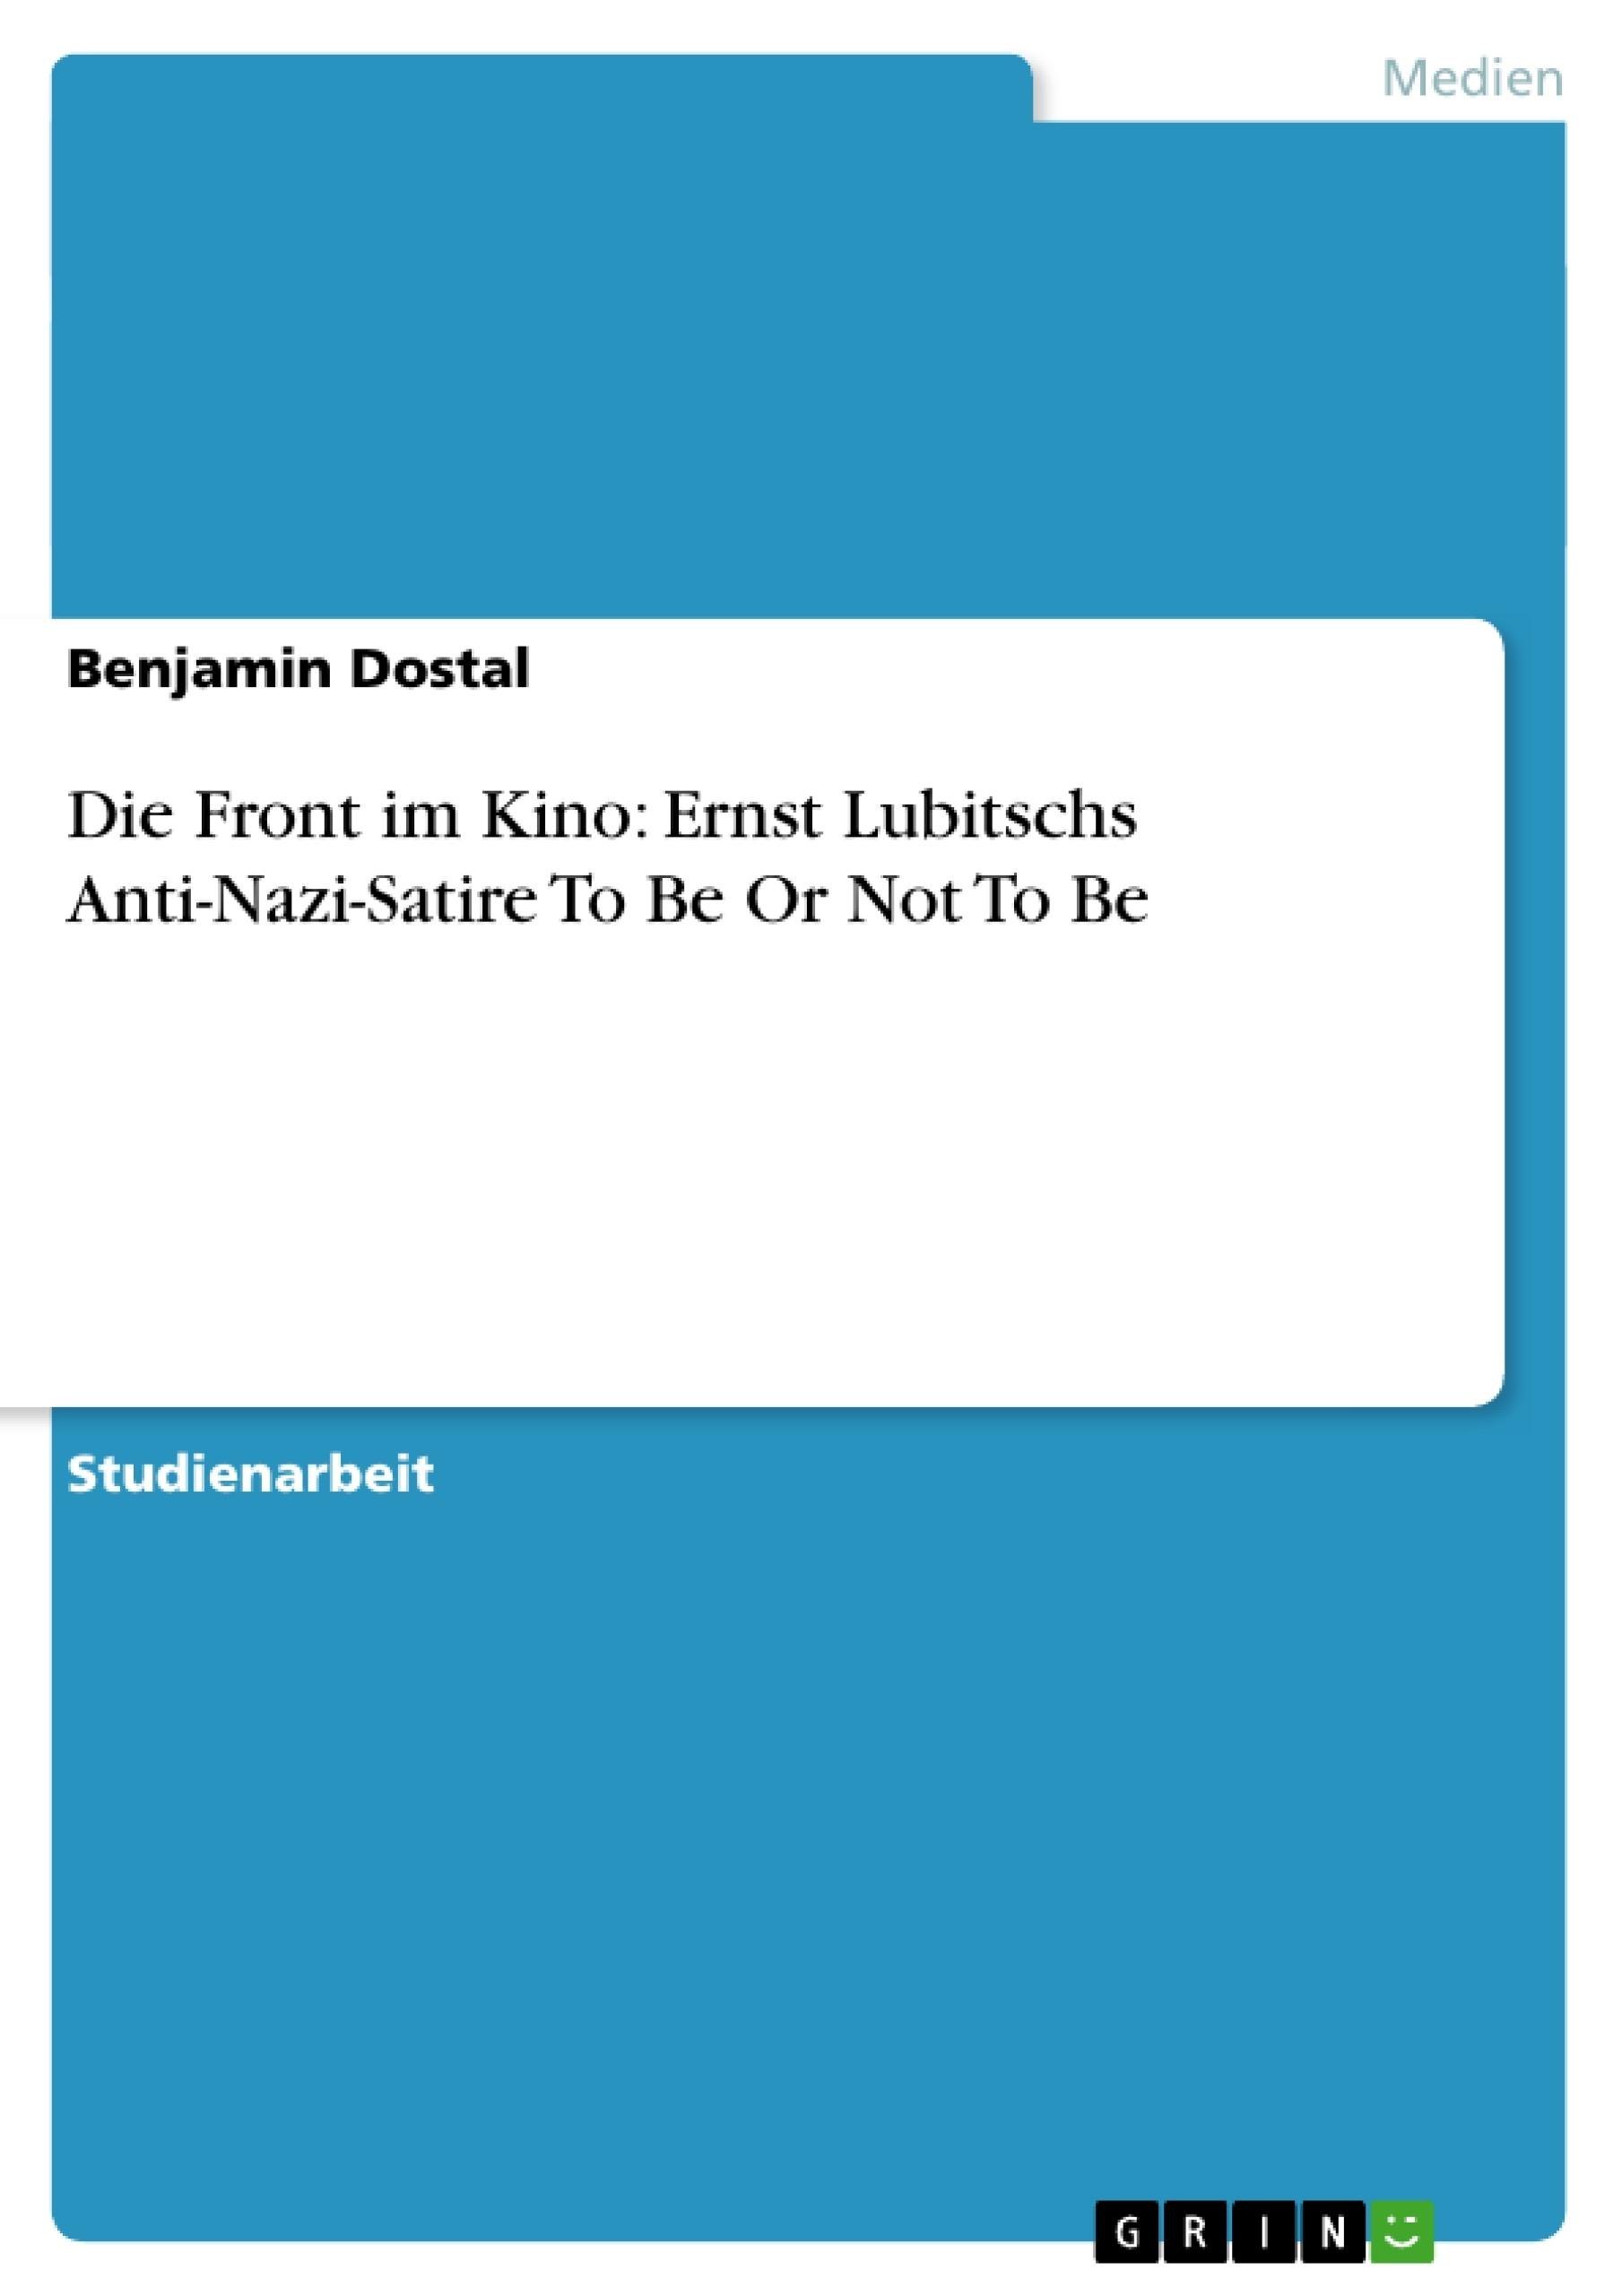 Titel: Die Front im Kino: Ernst Lubitschs Anti-Nazi-Satire To Be Or Not To Be